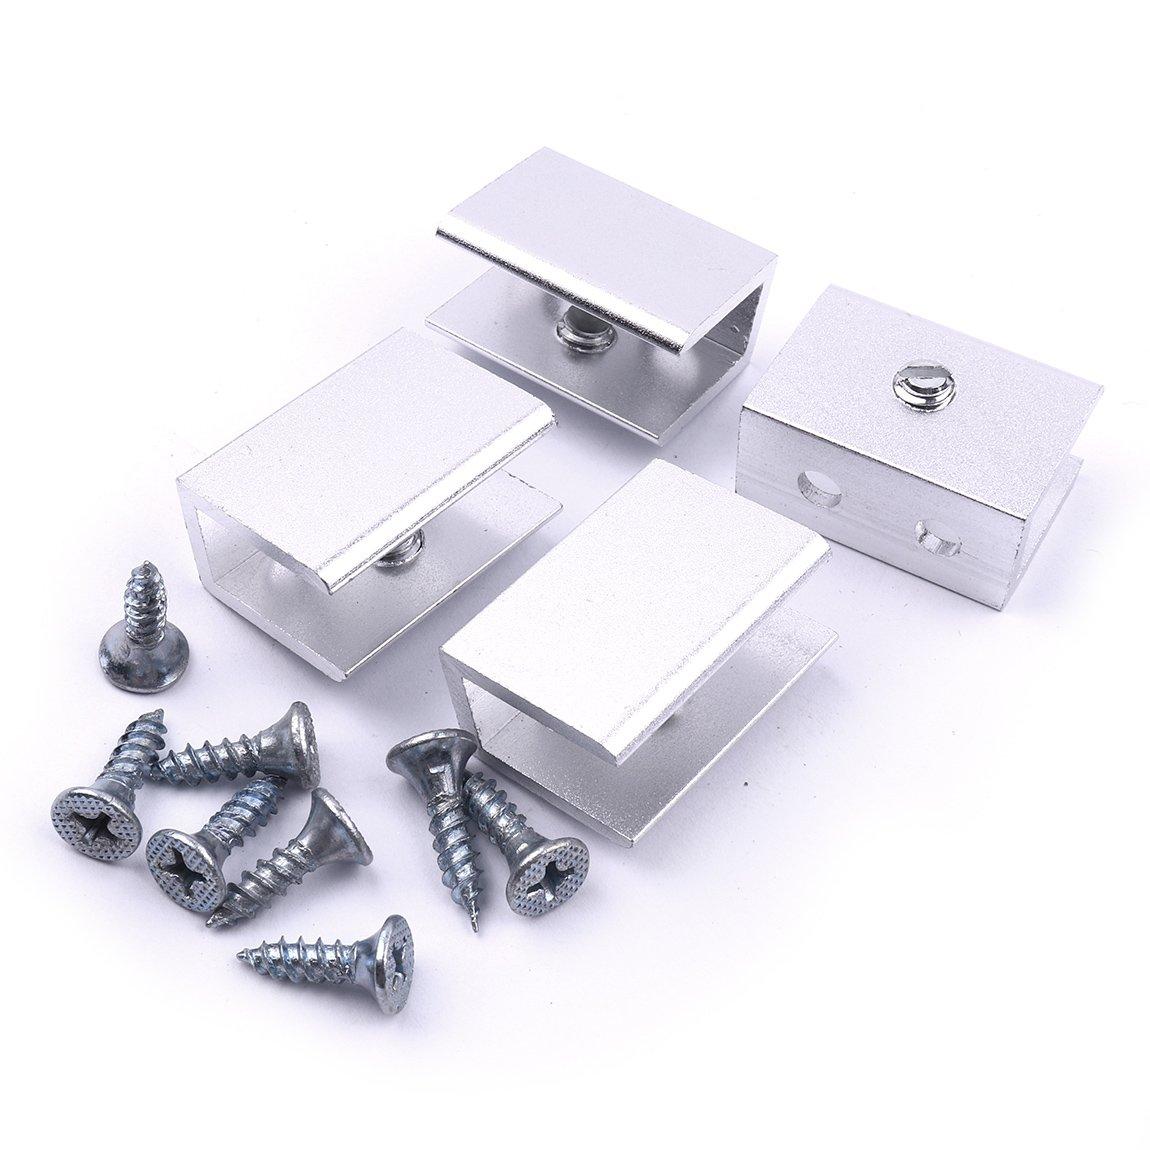 Adjustable Stainless Steel Glass Clamp Clip Holder 4pcs Glass Shelf Brackets